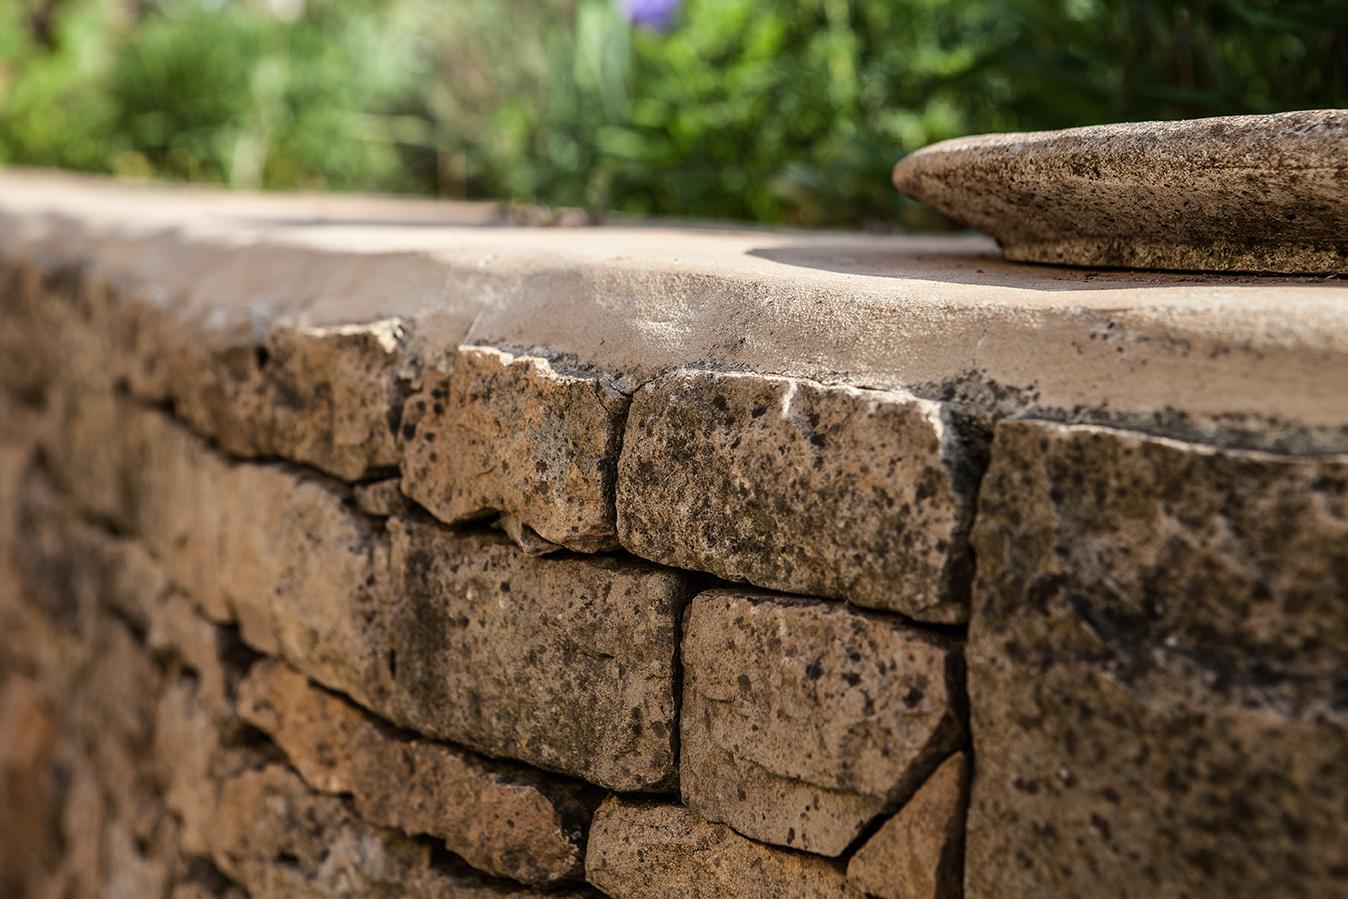 Realisation terrasse murets escalier allee jardin pierre recuperation 2